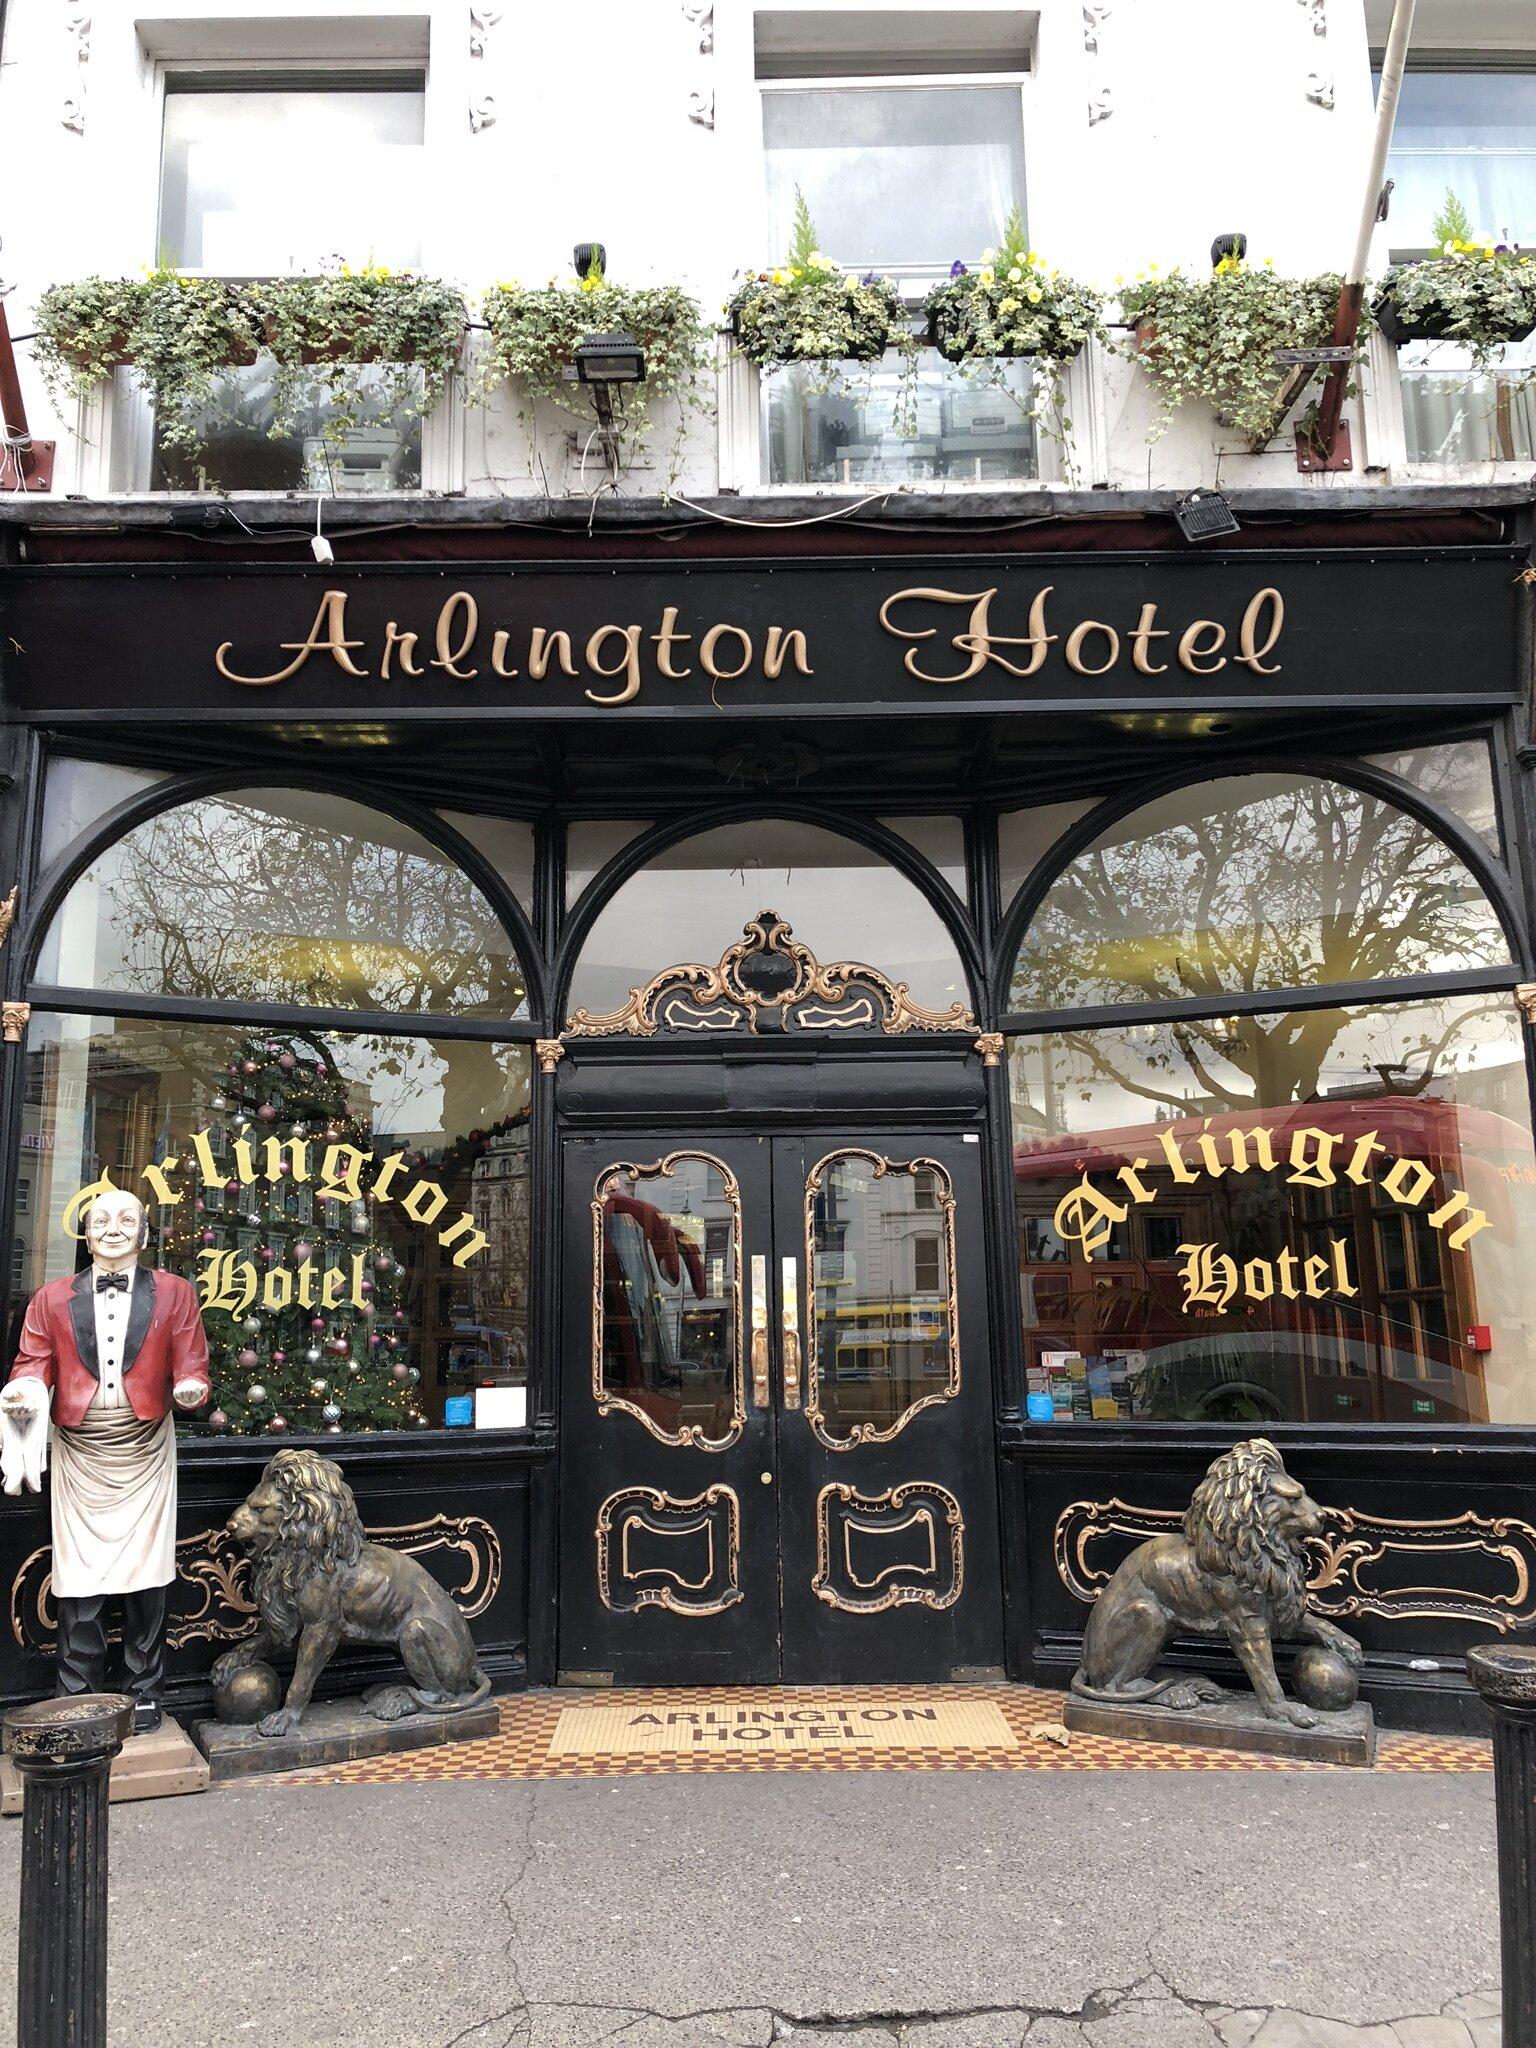 Arlington Hotel in Dublin.